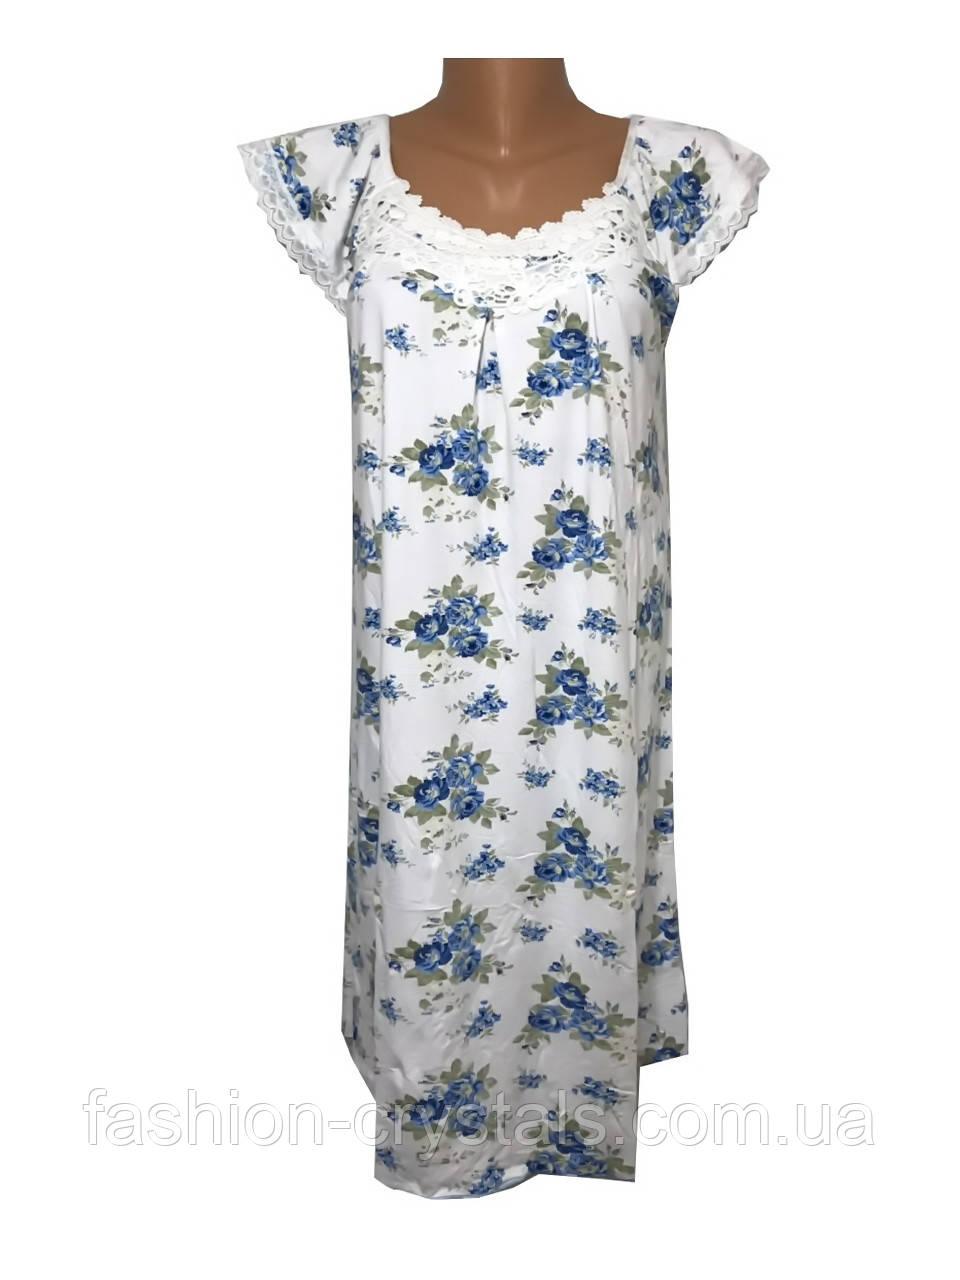 Ночная рубашка с кружевом